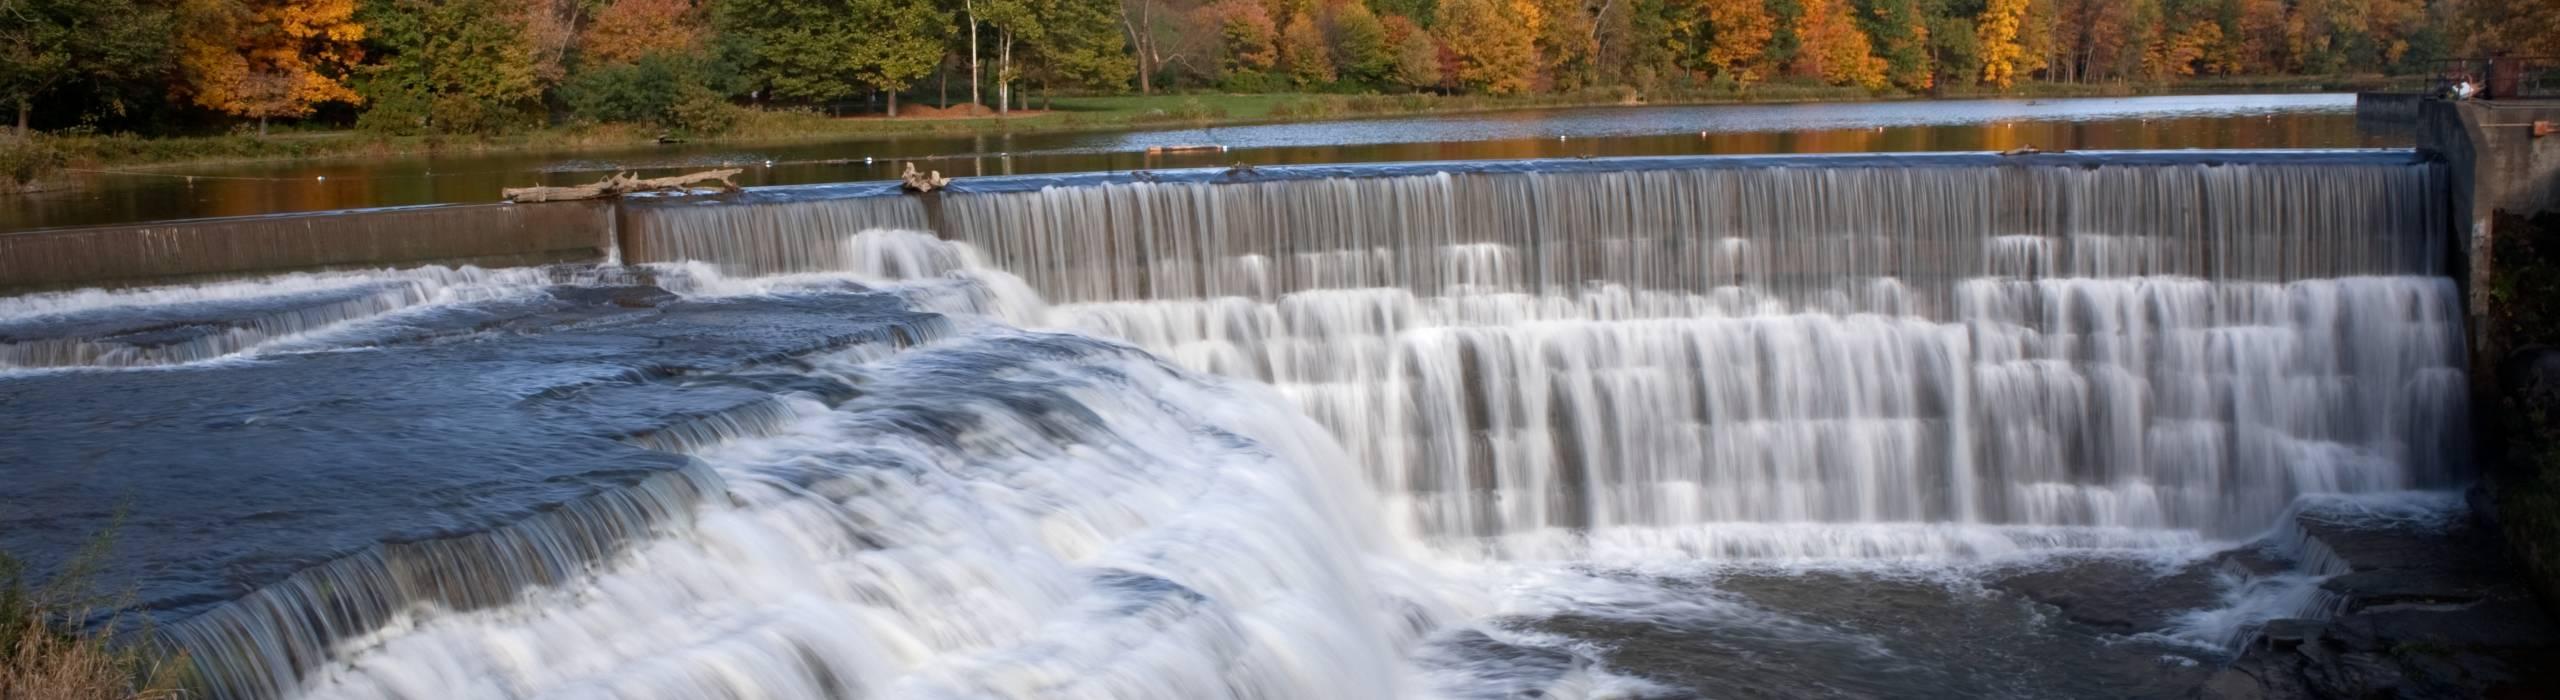 Beebe Lake and Beebe Dam in fall.